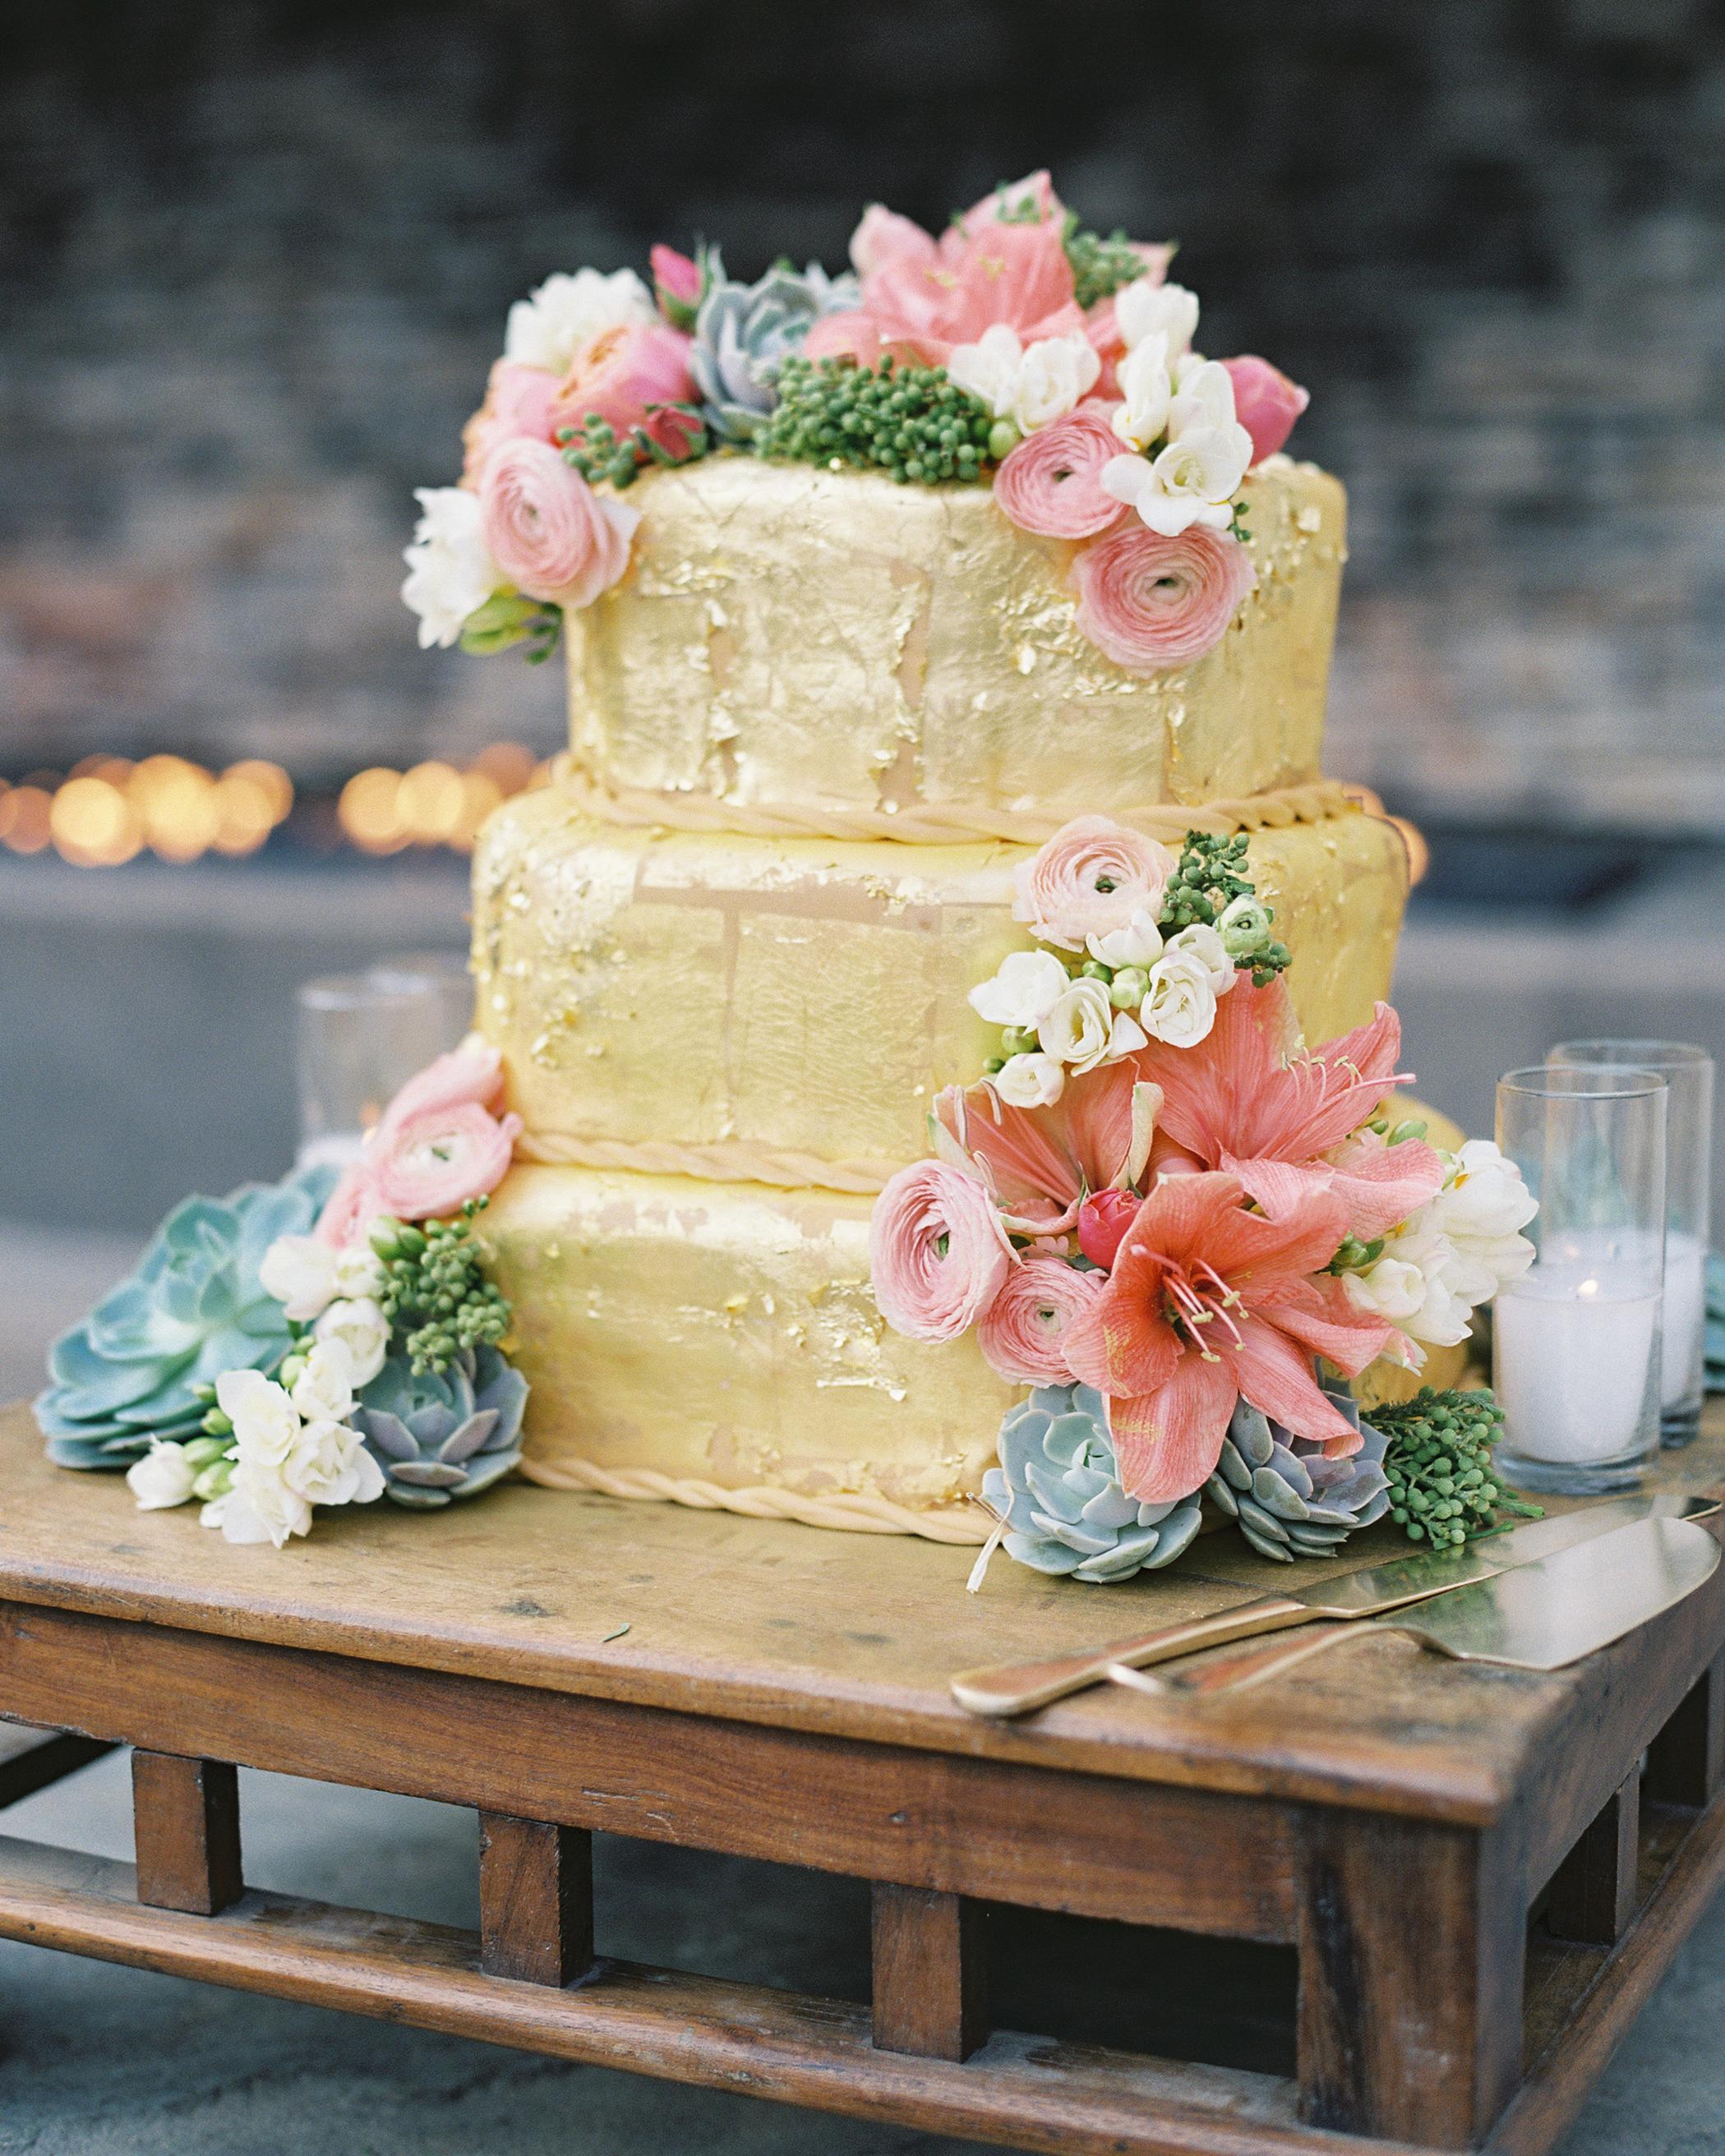 katherine-jared-wedding-1036-ds111387.jpg